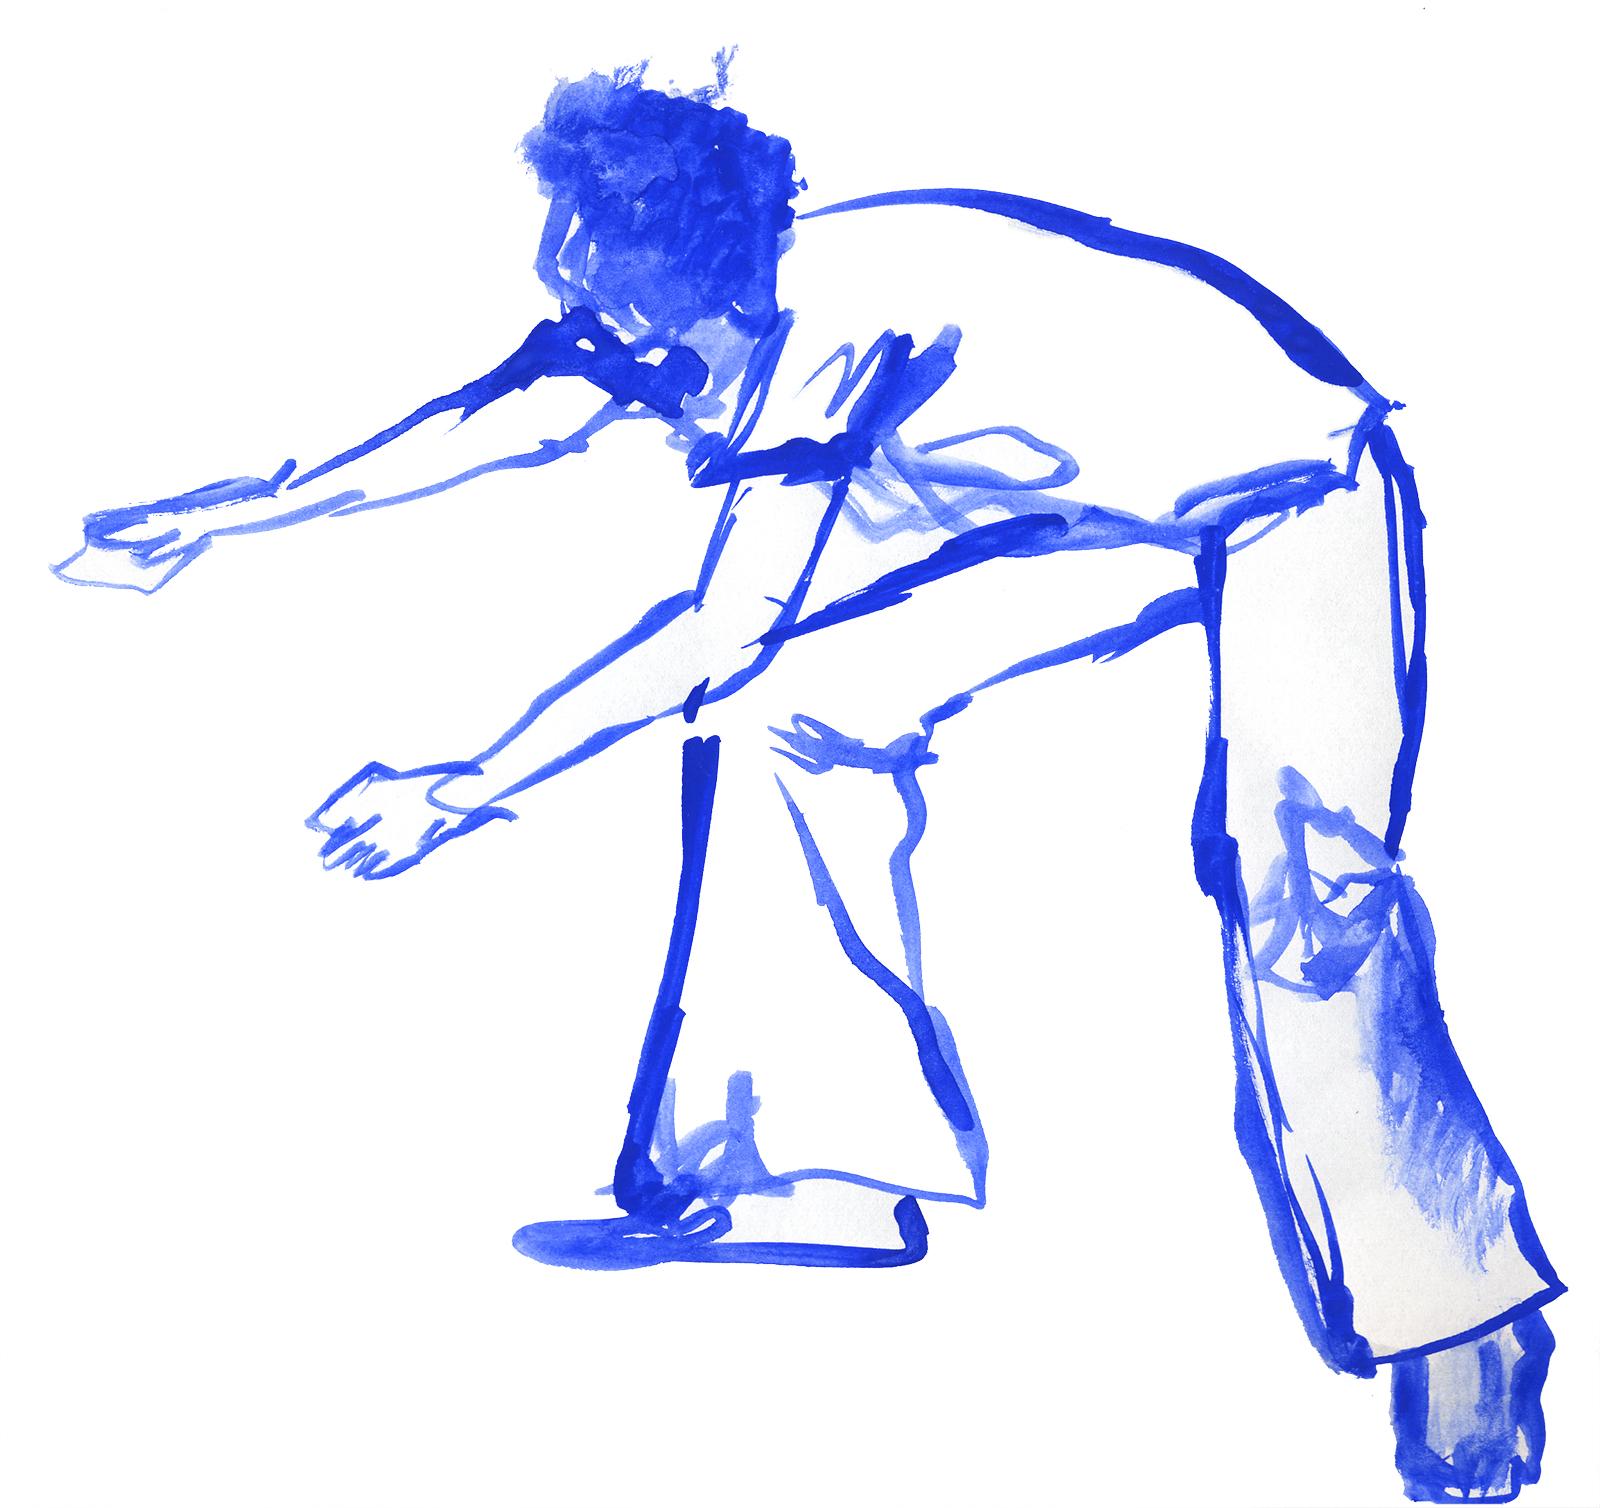 http://bigeyes.co.il/wp-content/uploads/2019/03/Blue-Sketch-2.jpg